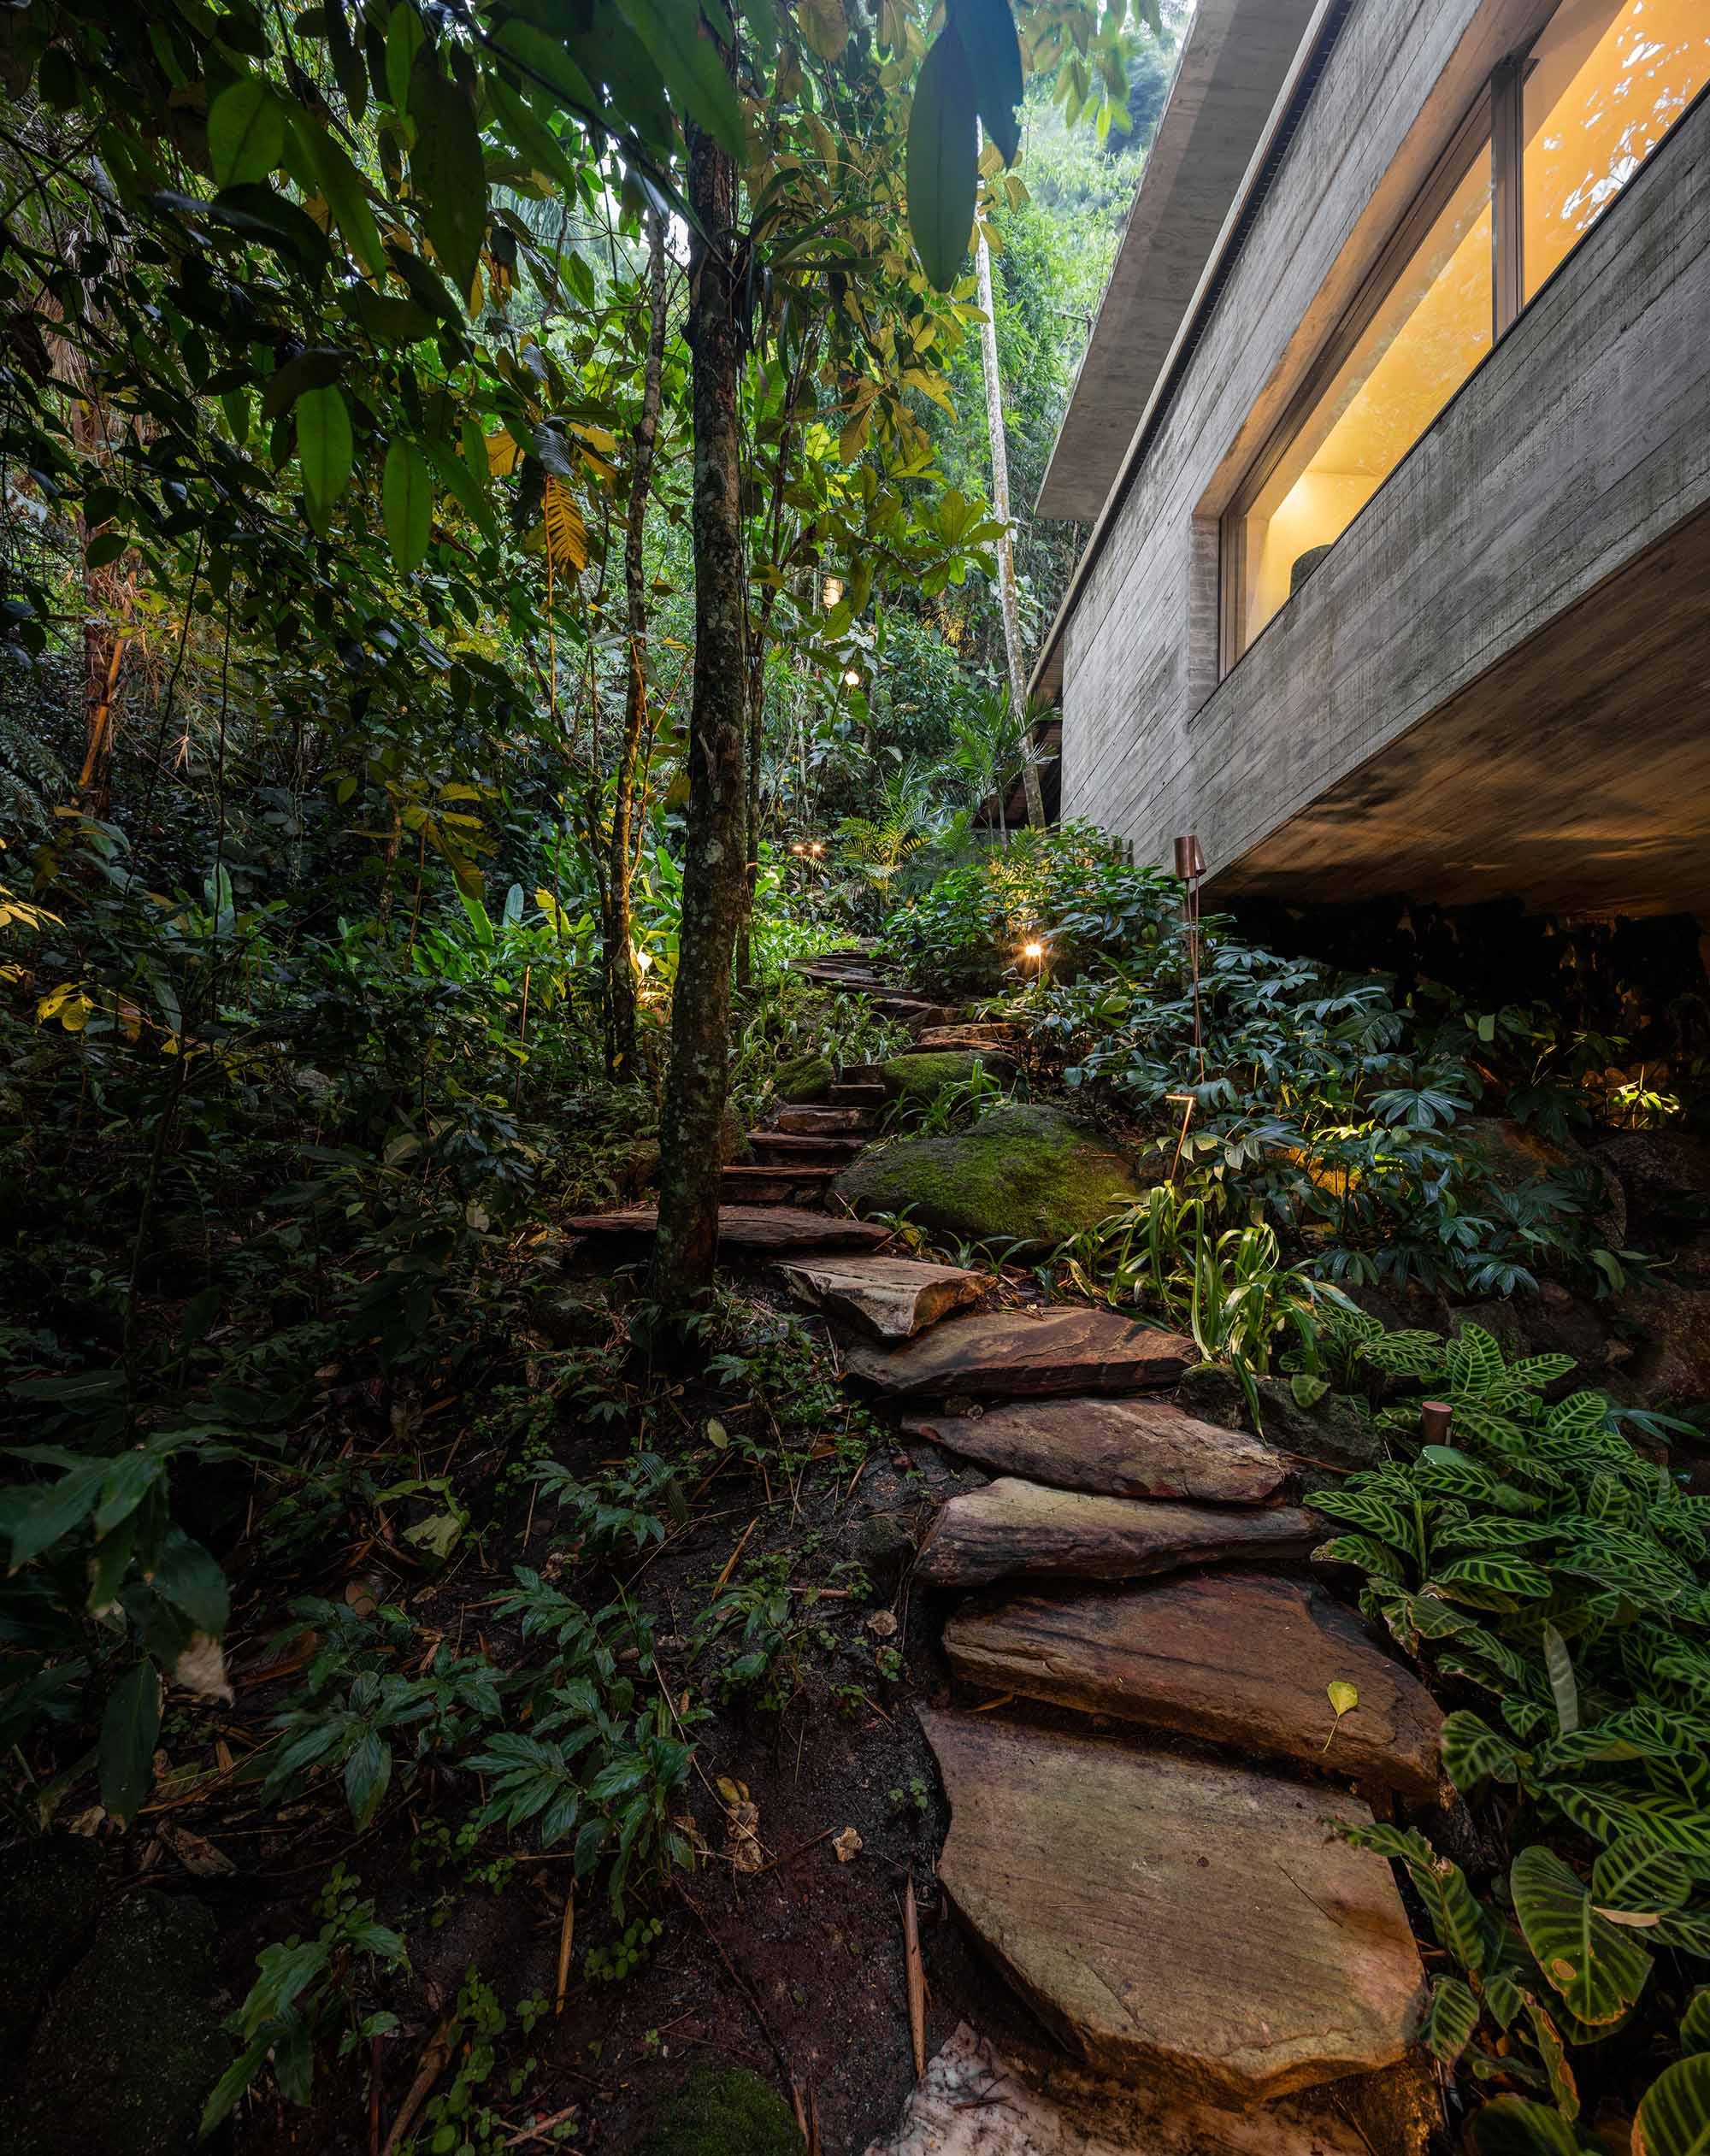 H-House-Life-Jungle-House-Casa-Da-Mata-studio-mk27-mk27_namata_fernandoguerra_medium(48).JPG